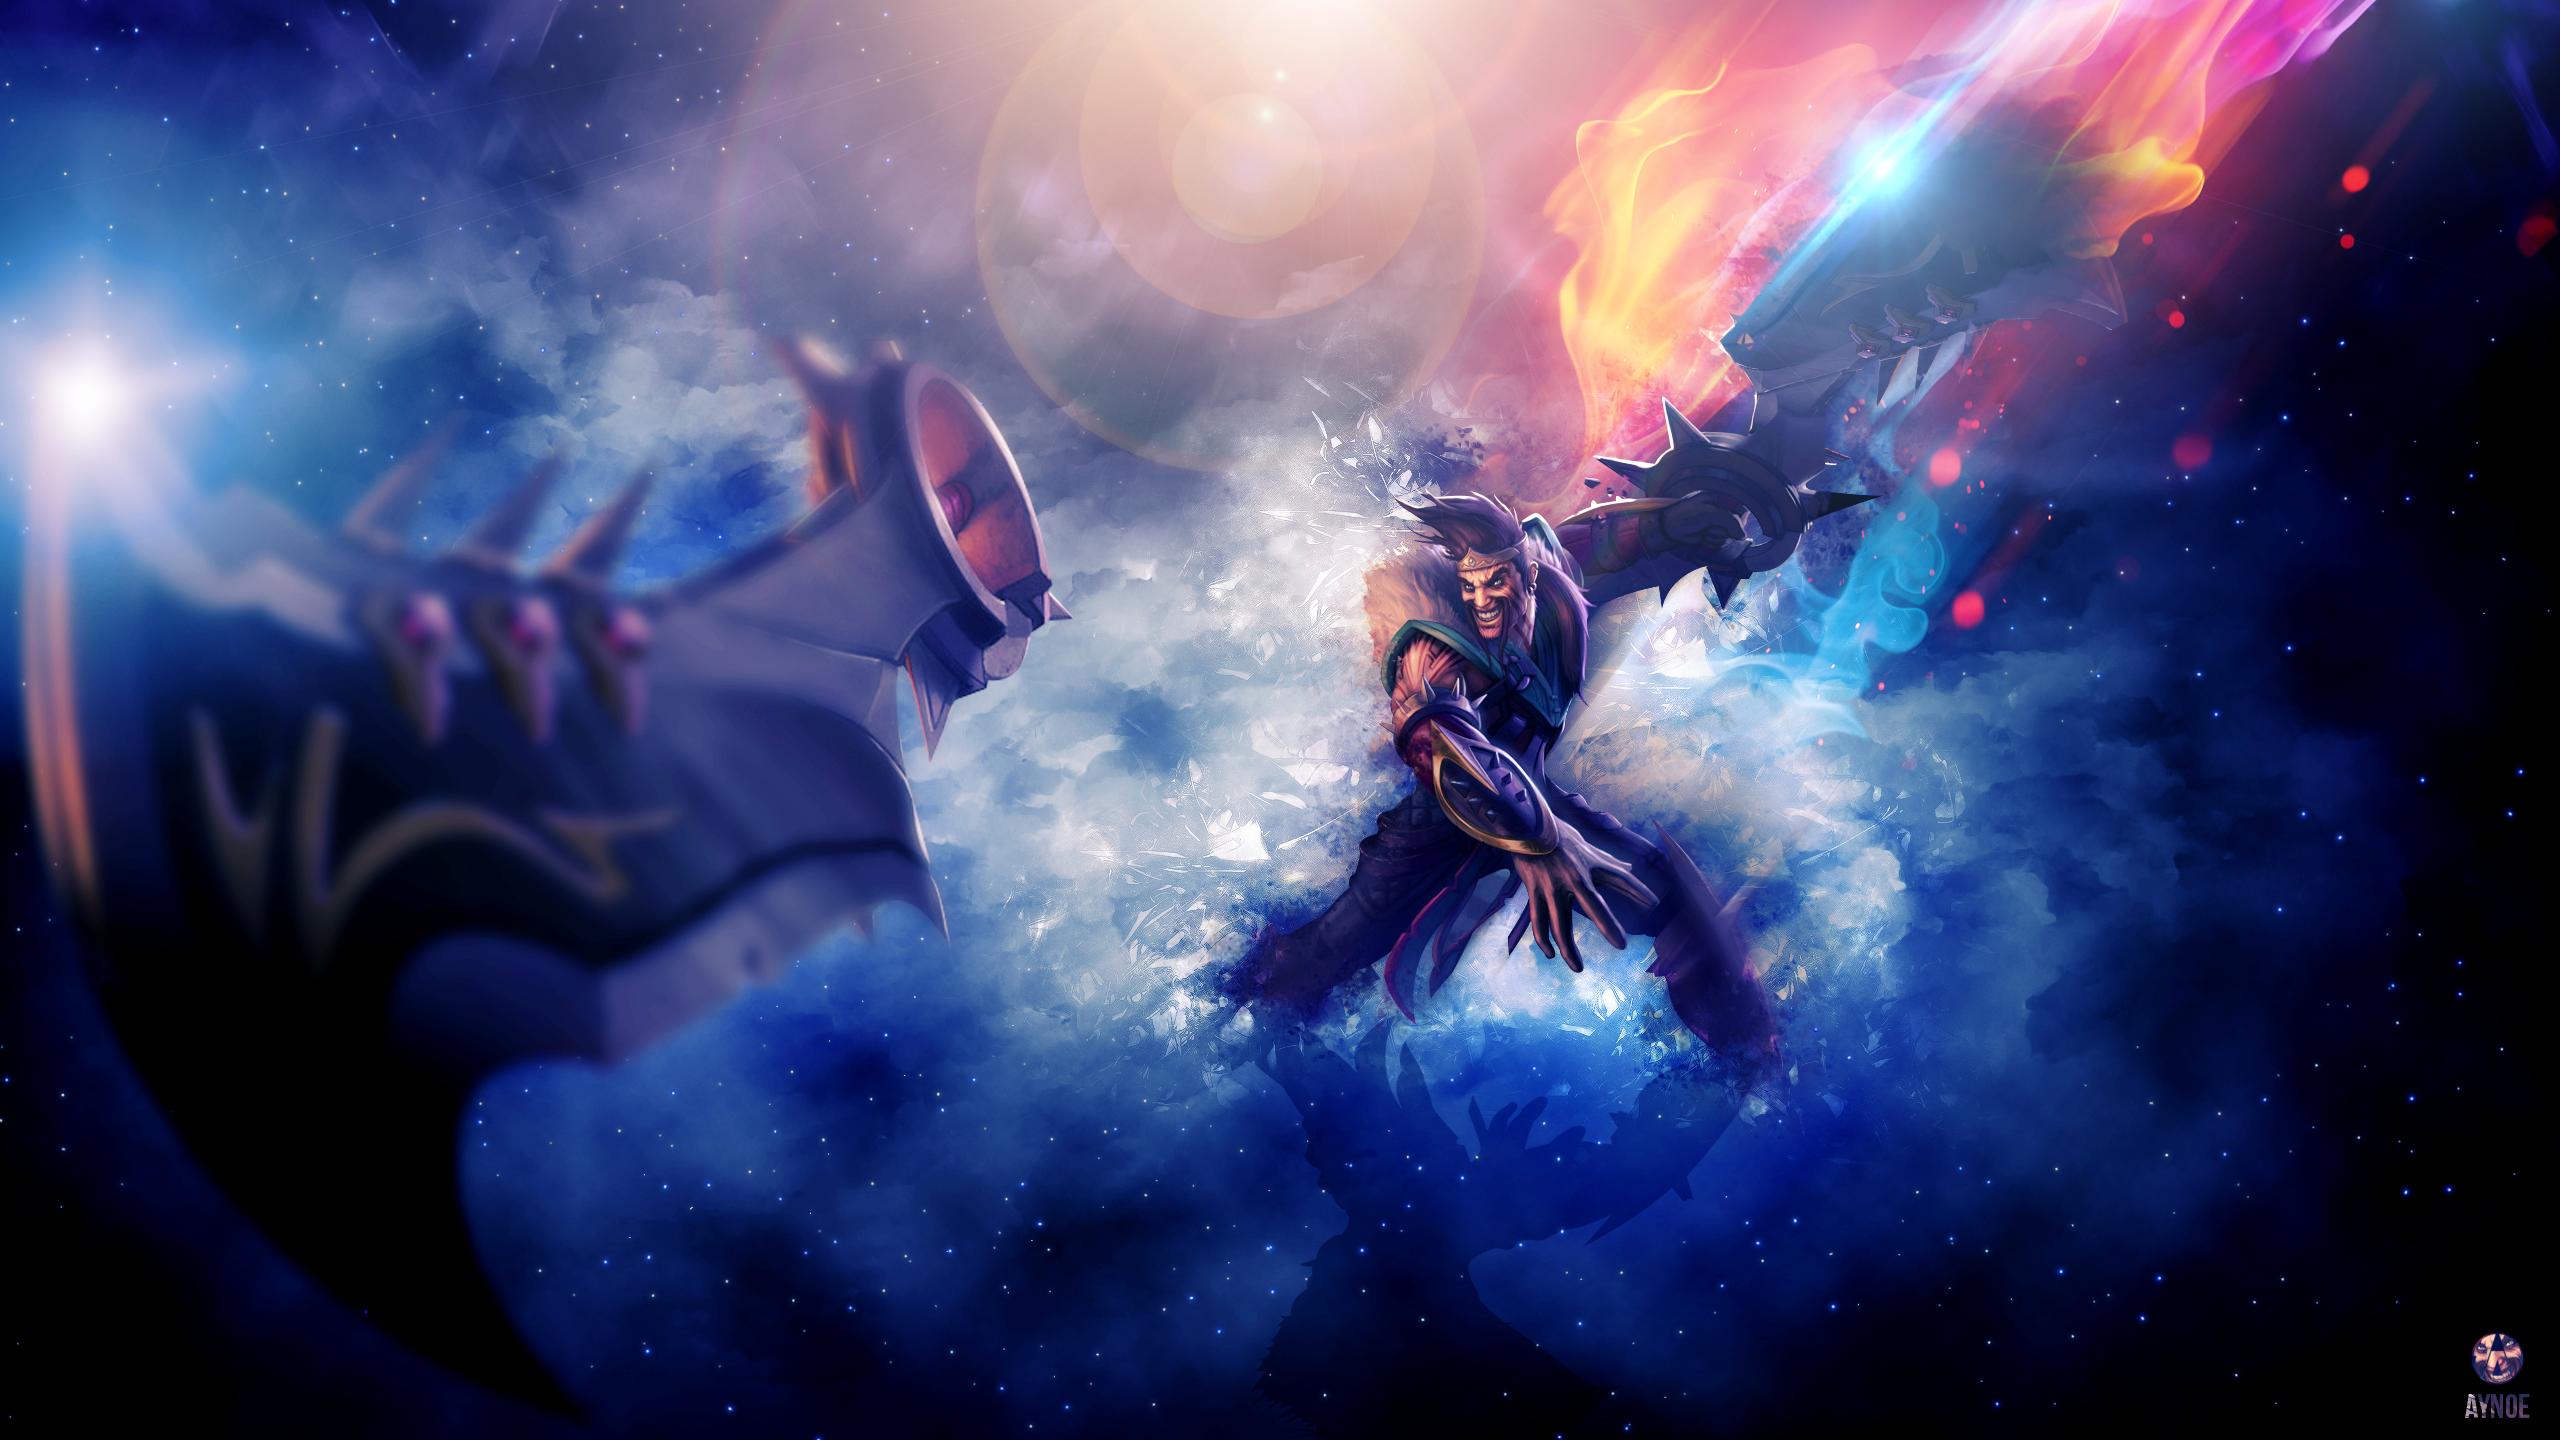 Wallpaper League Of Legends Draven Adc Marksman Noxus